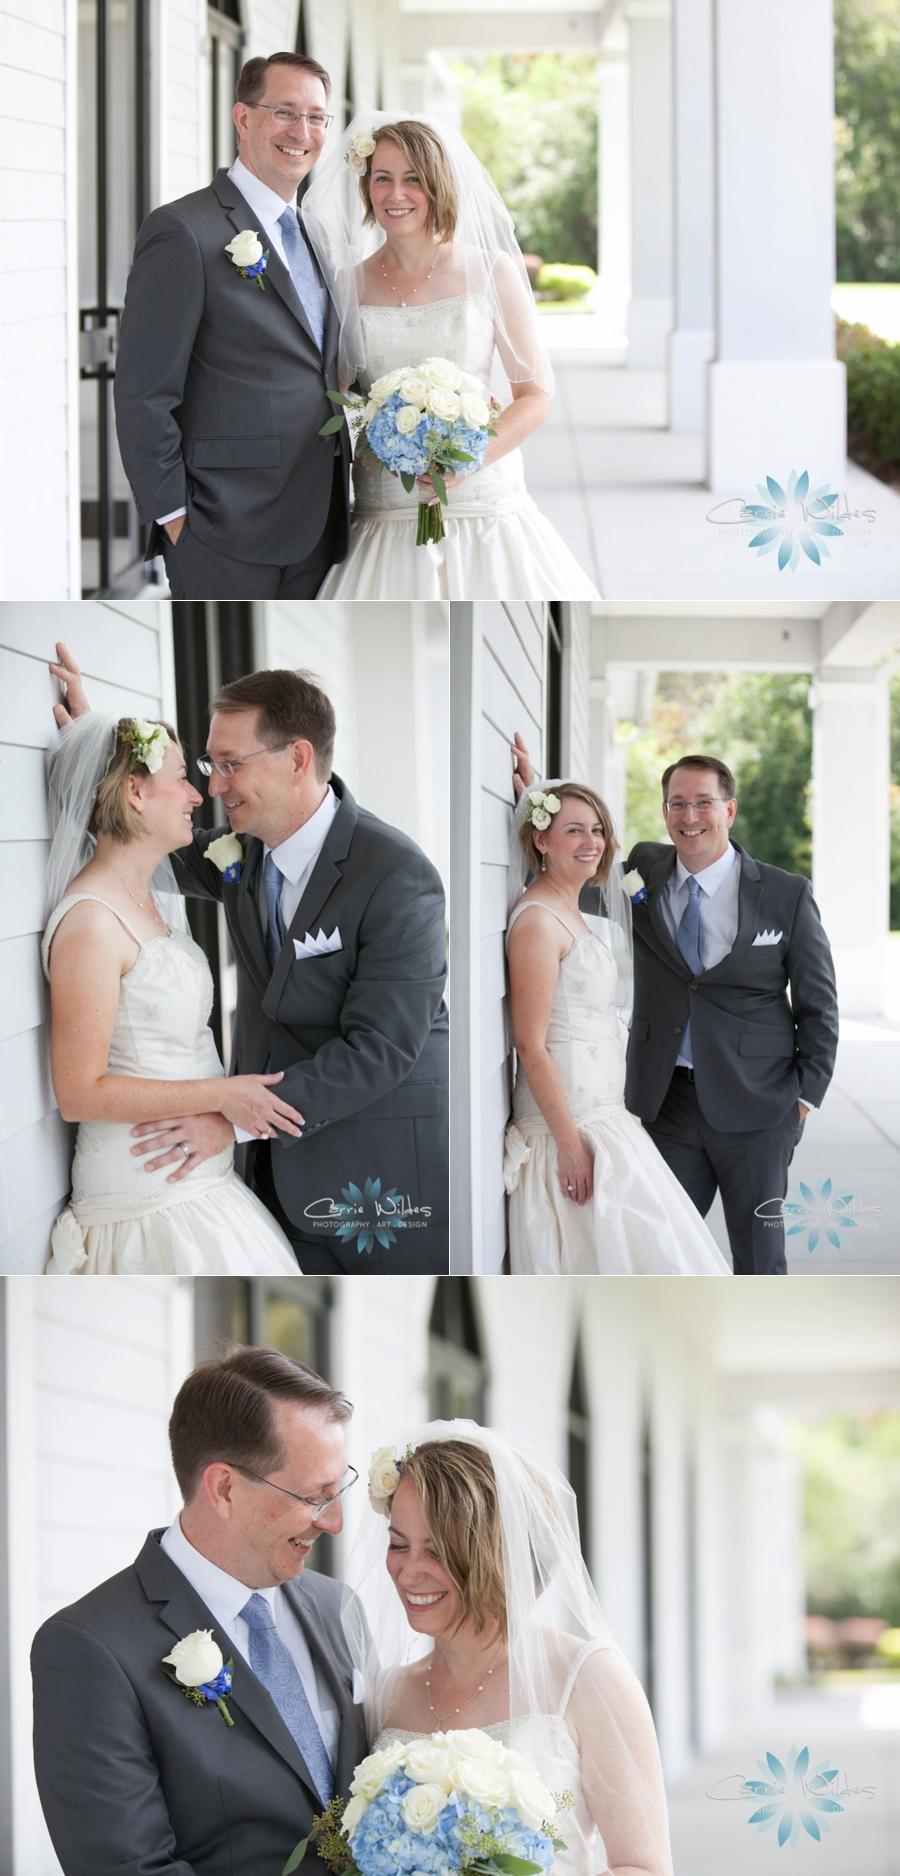 10_11_15 Van Dyke CHurch Wedding_0010.jpg